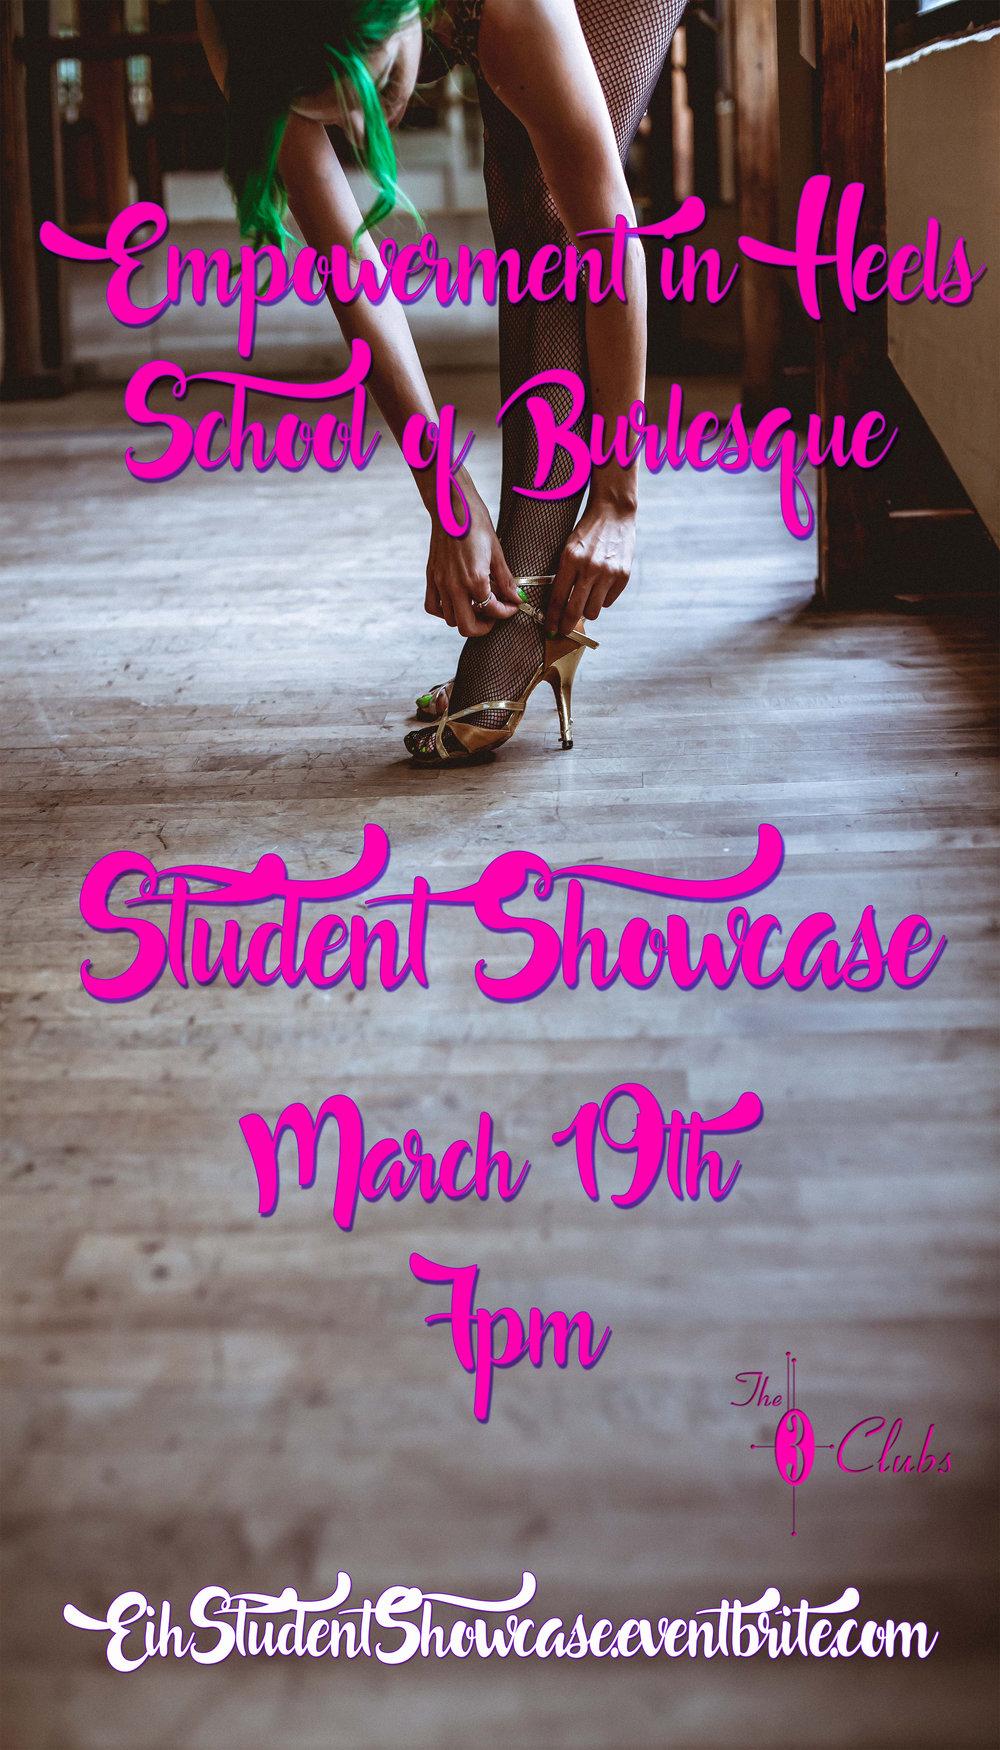 Empowerment in heels Showcase Promo.jpg